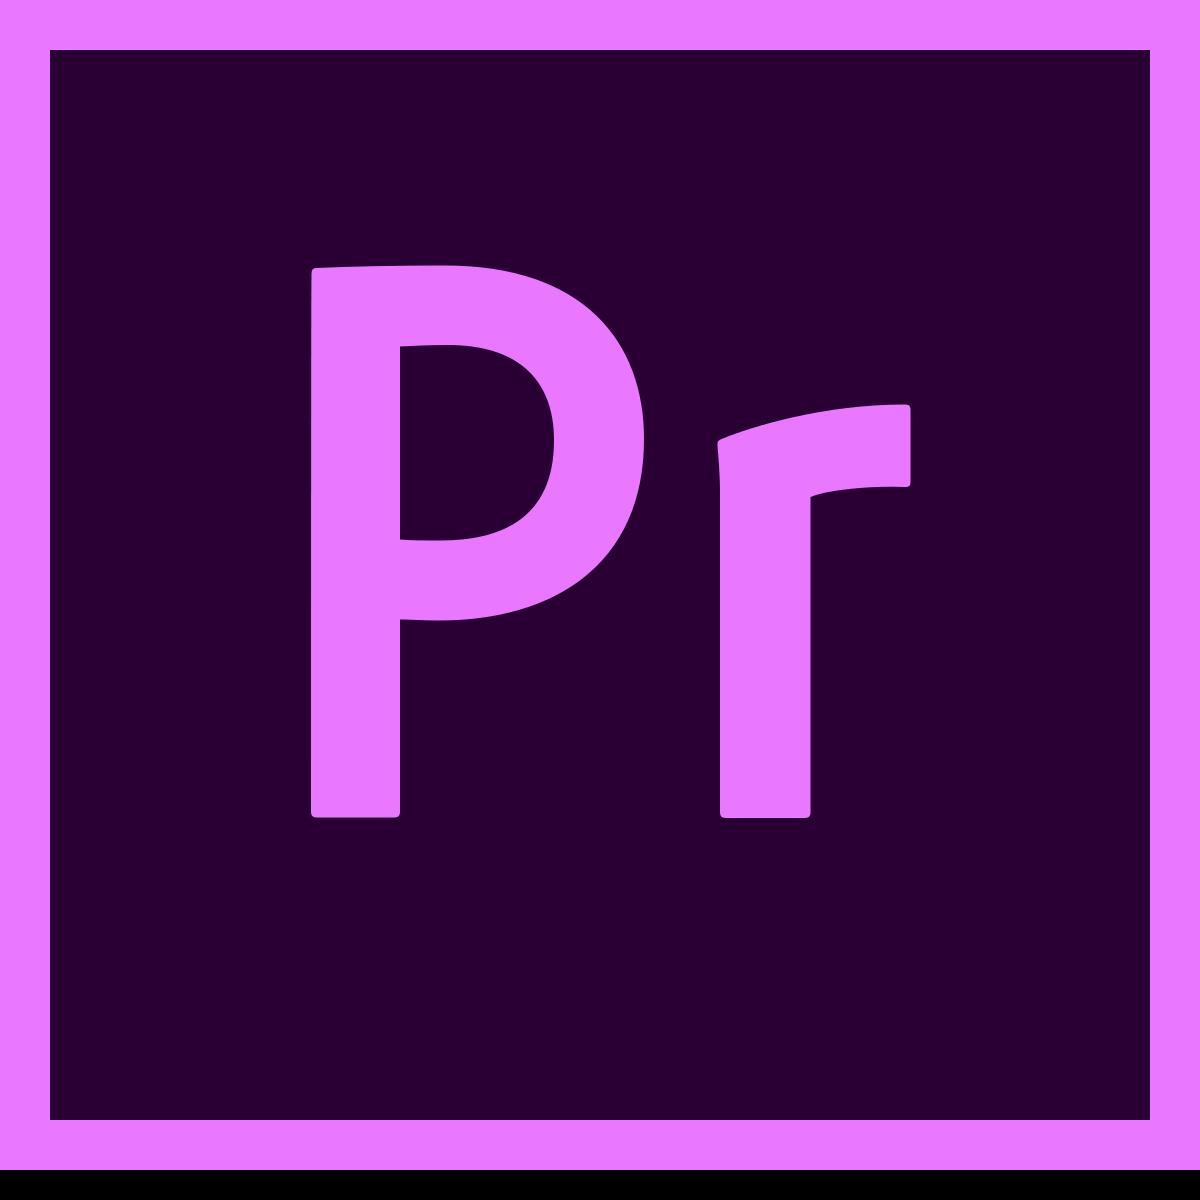 logo of adobe premiere pro, a simon says integration